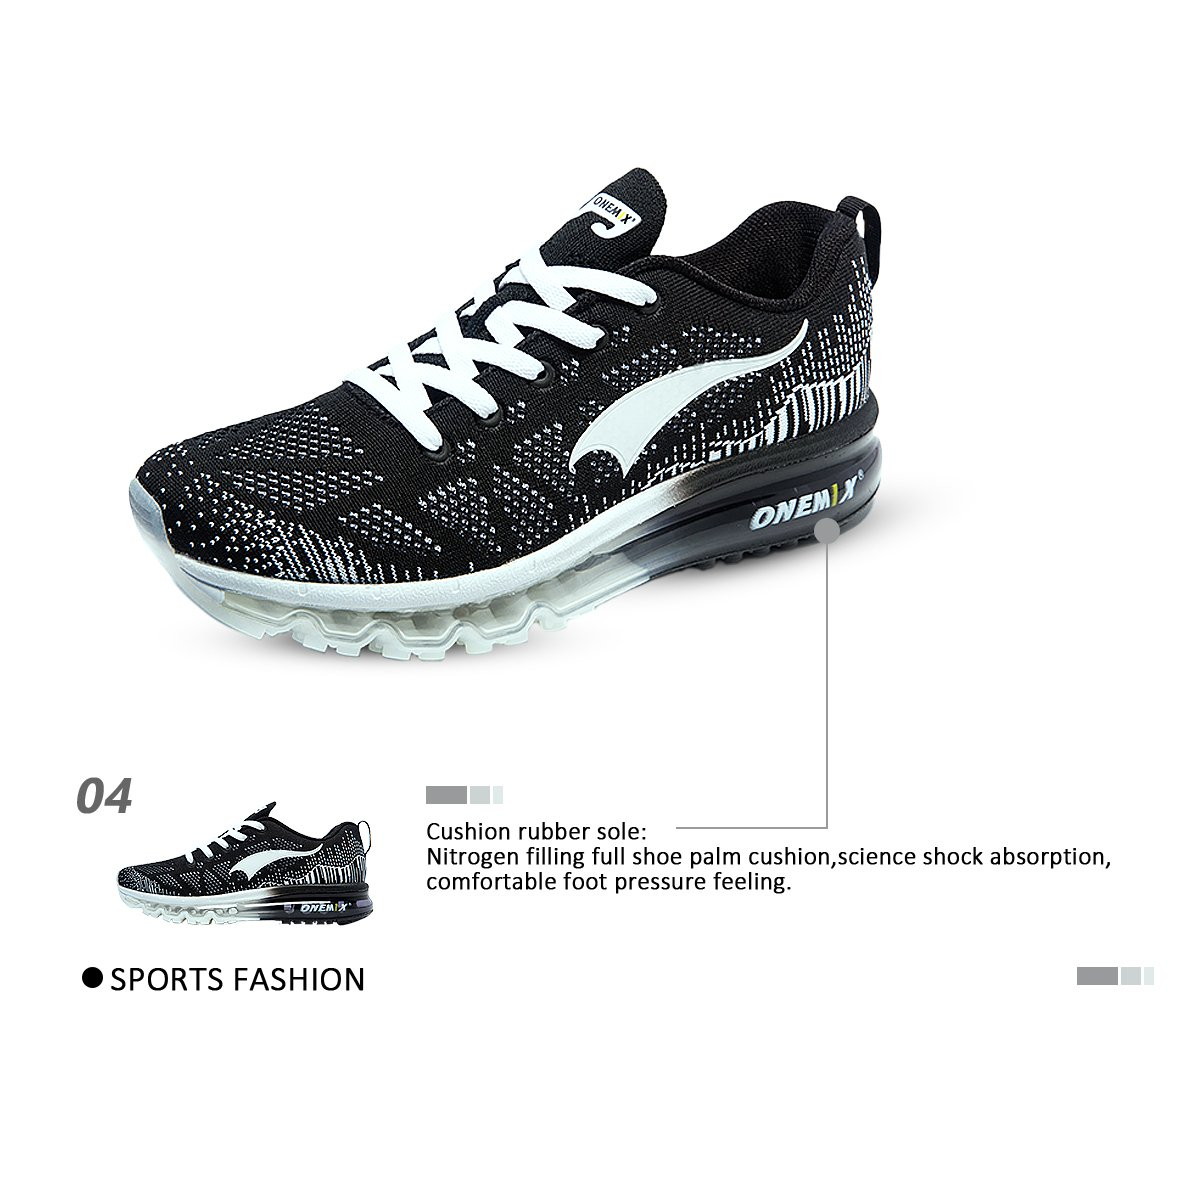 ONEMIX Women's Lightweight Air Cushion Outdoor Sport Running Shoes B071XRBWYH Women 5.5(M)US/Kid 4(M)US 36EU|Black White